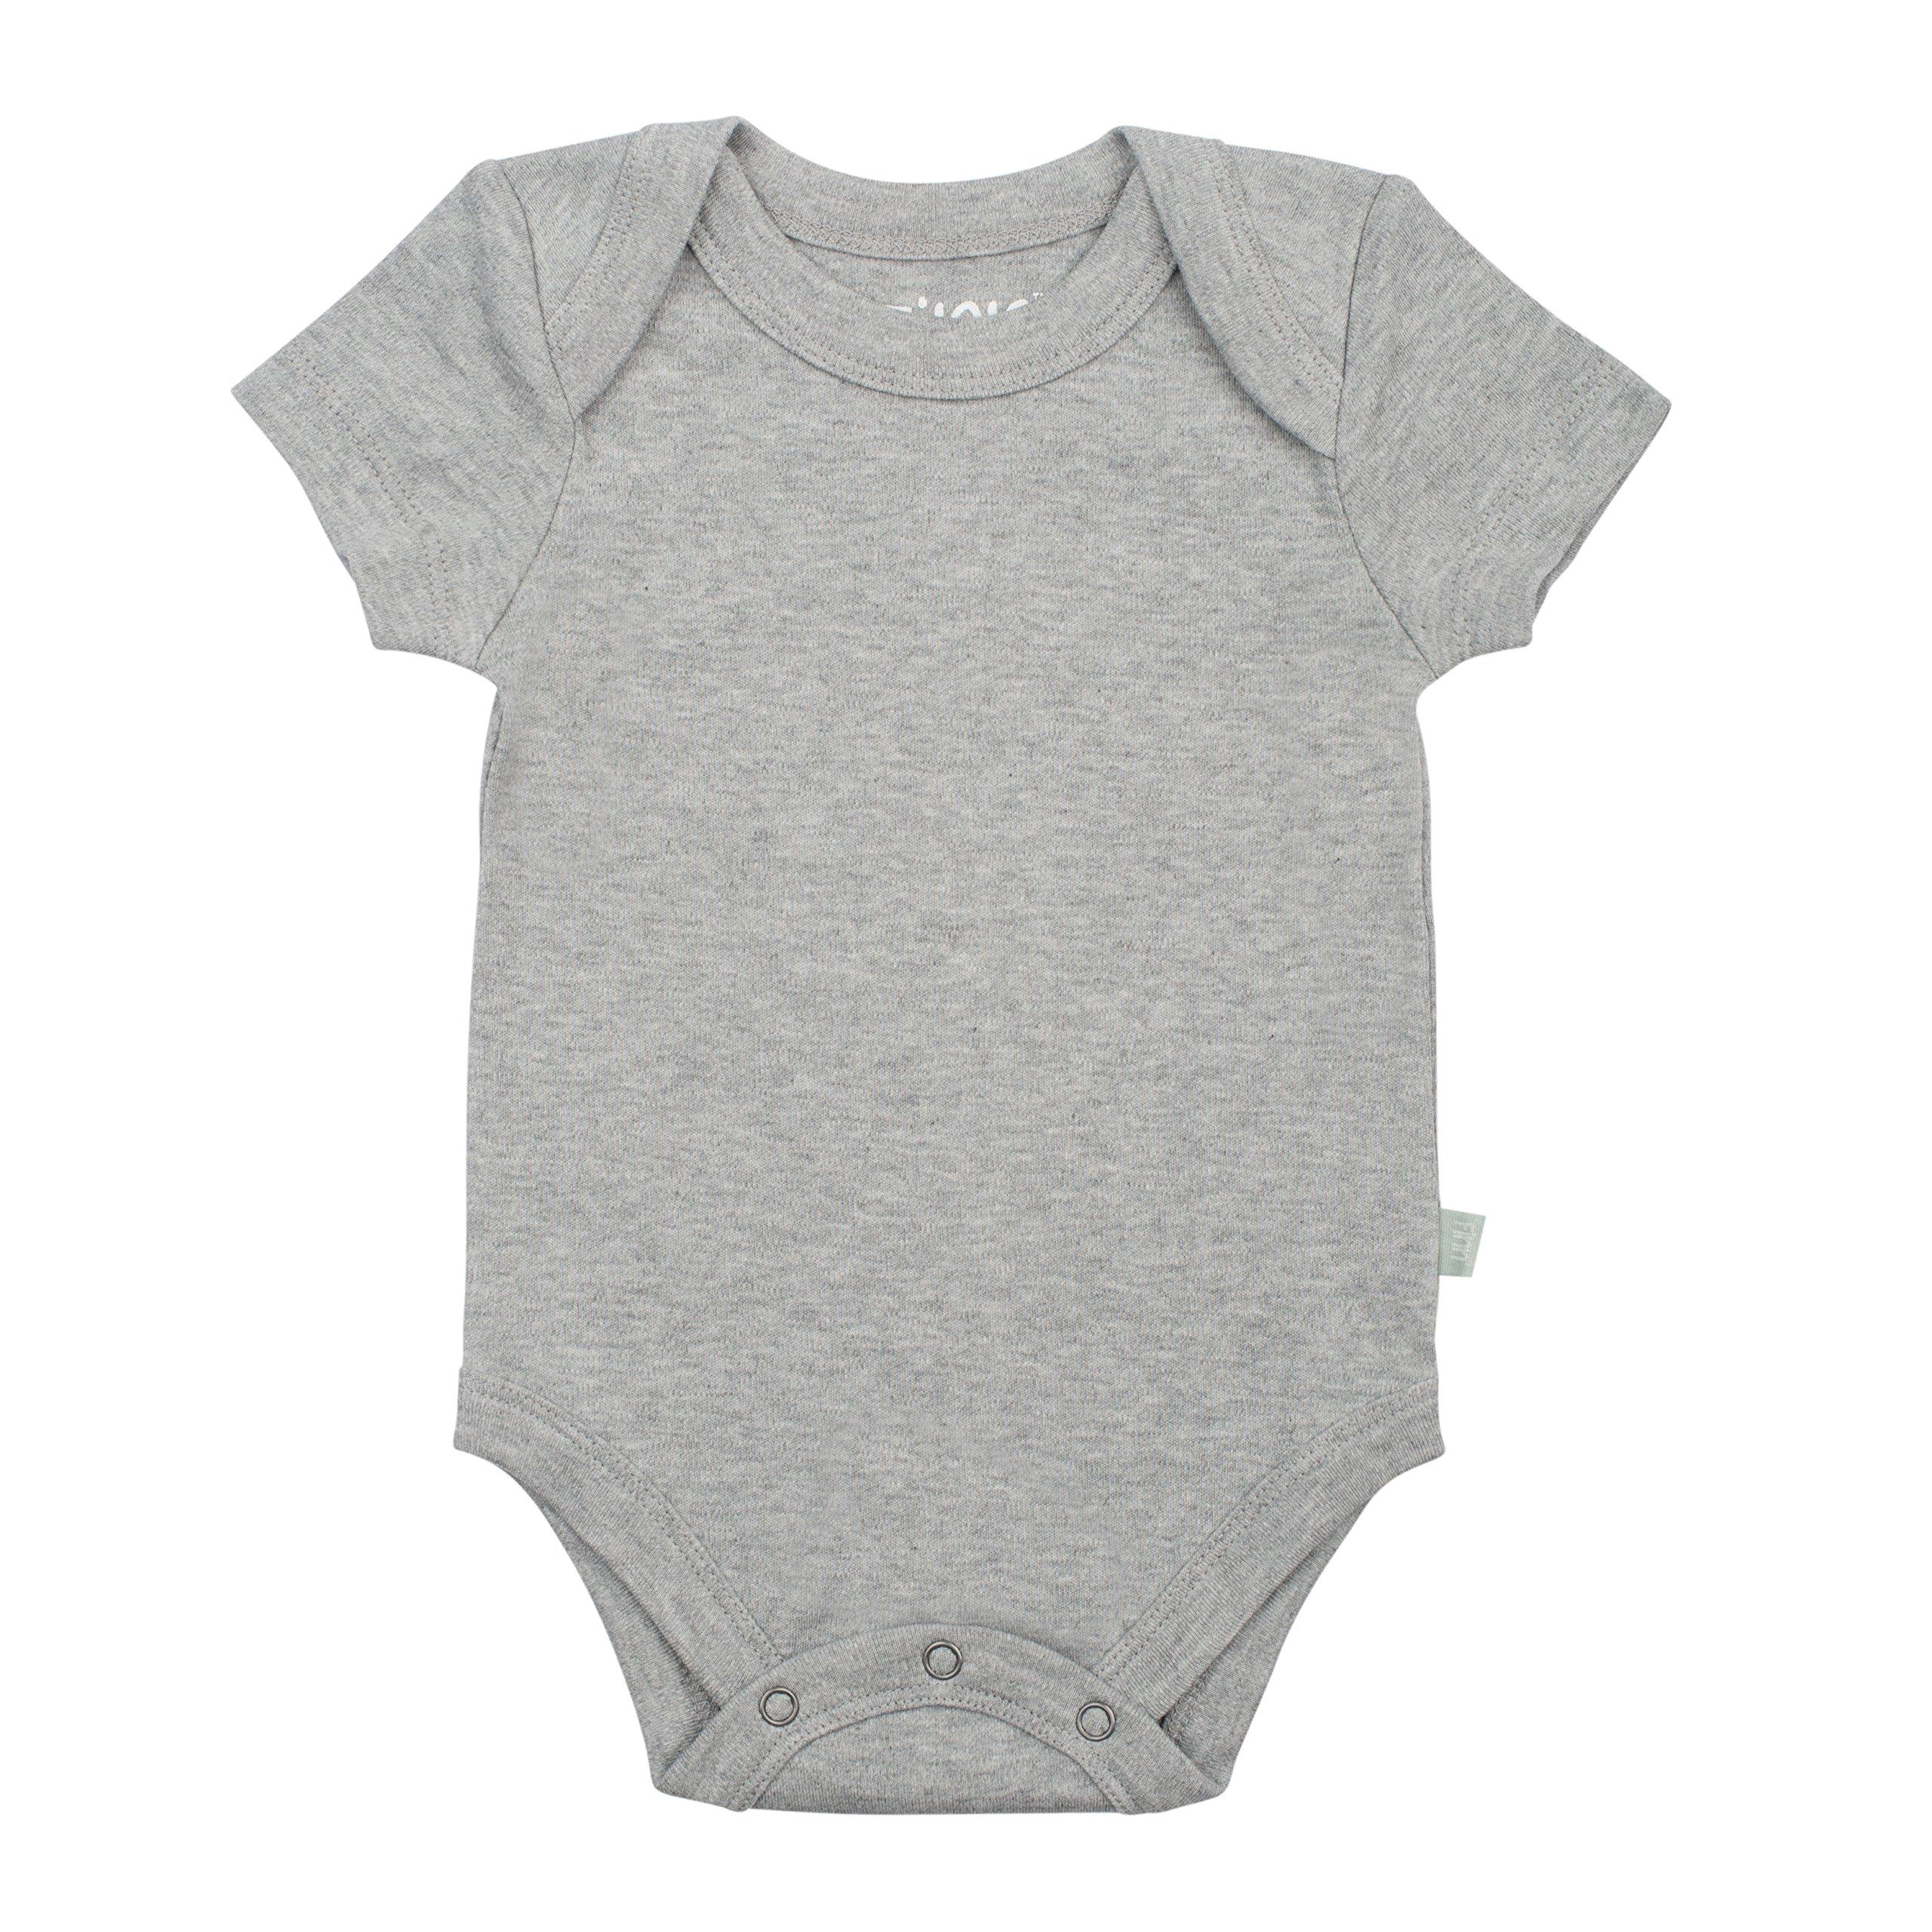 Finn + Emma Basics Organic Cotton Lap Baby Bodysuit - Heather Gray, 3-6 Months